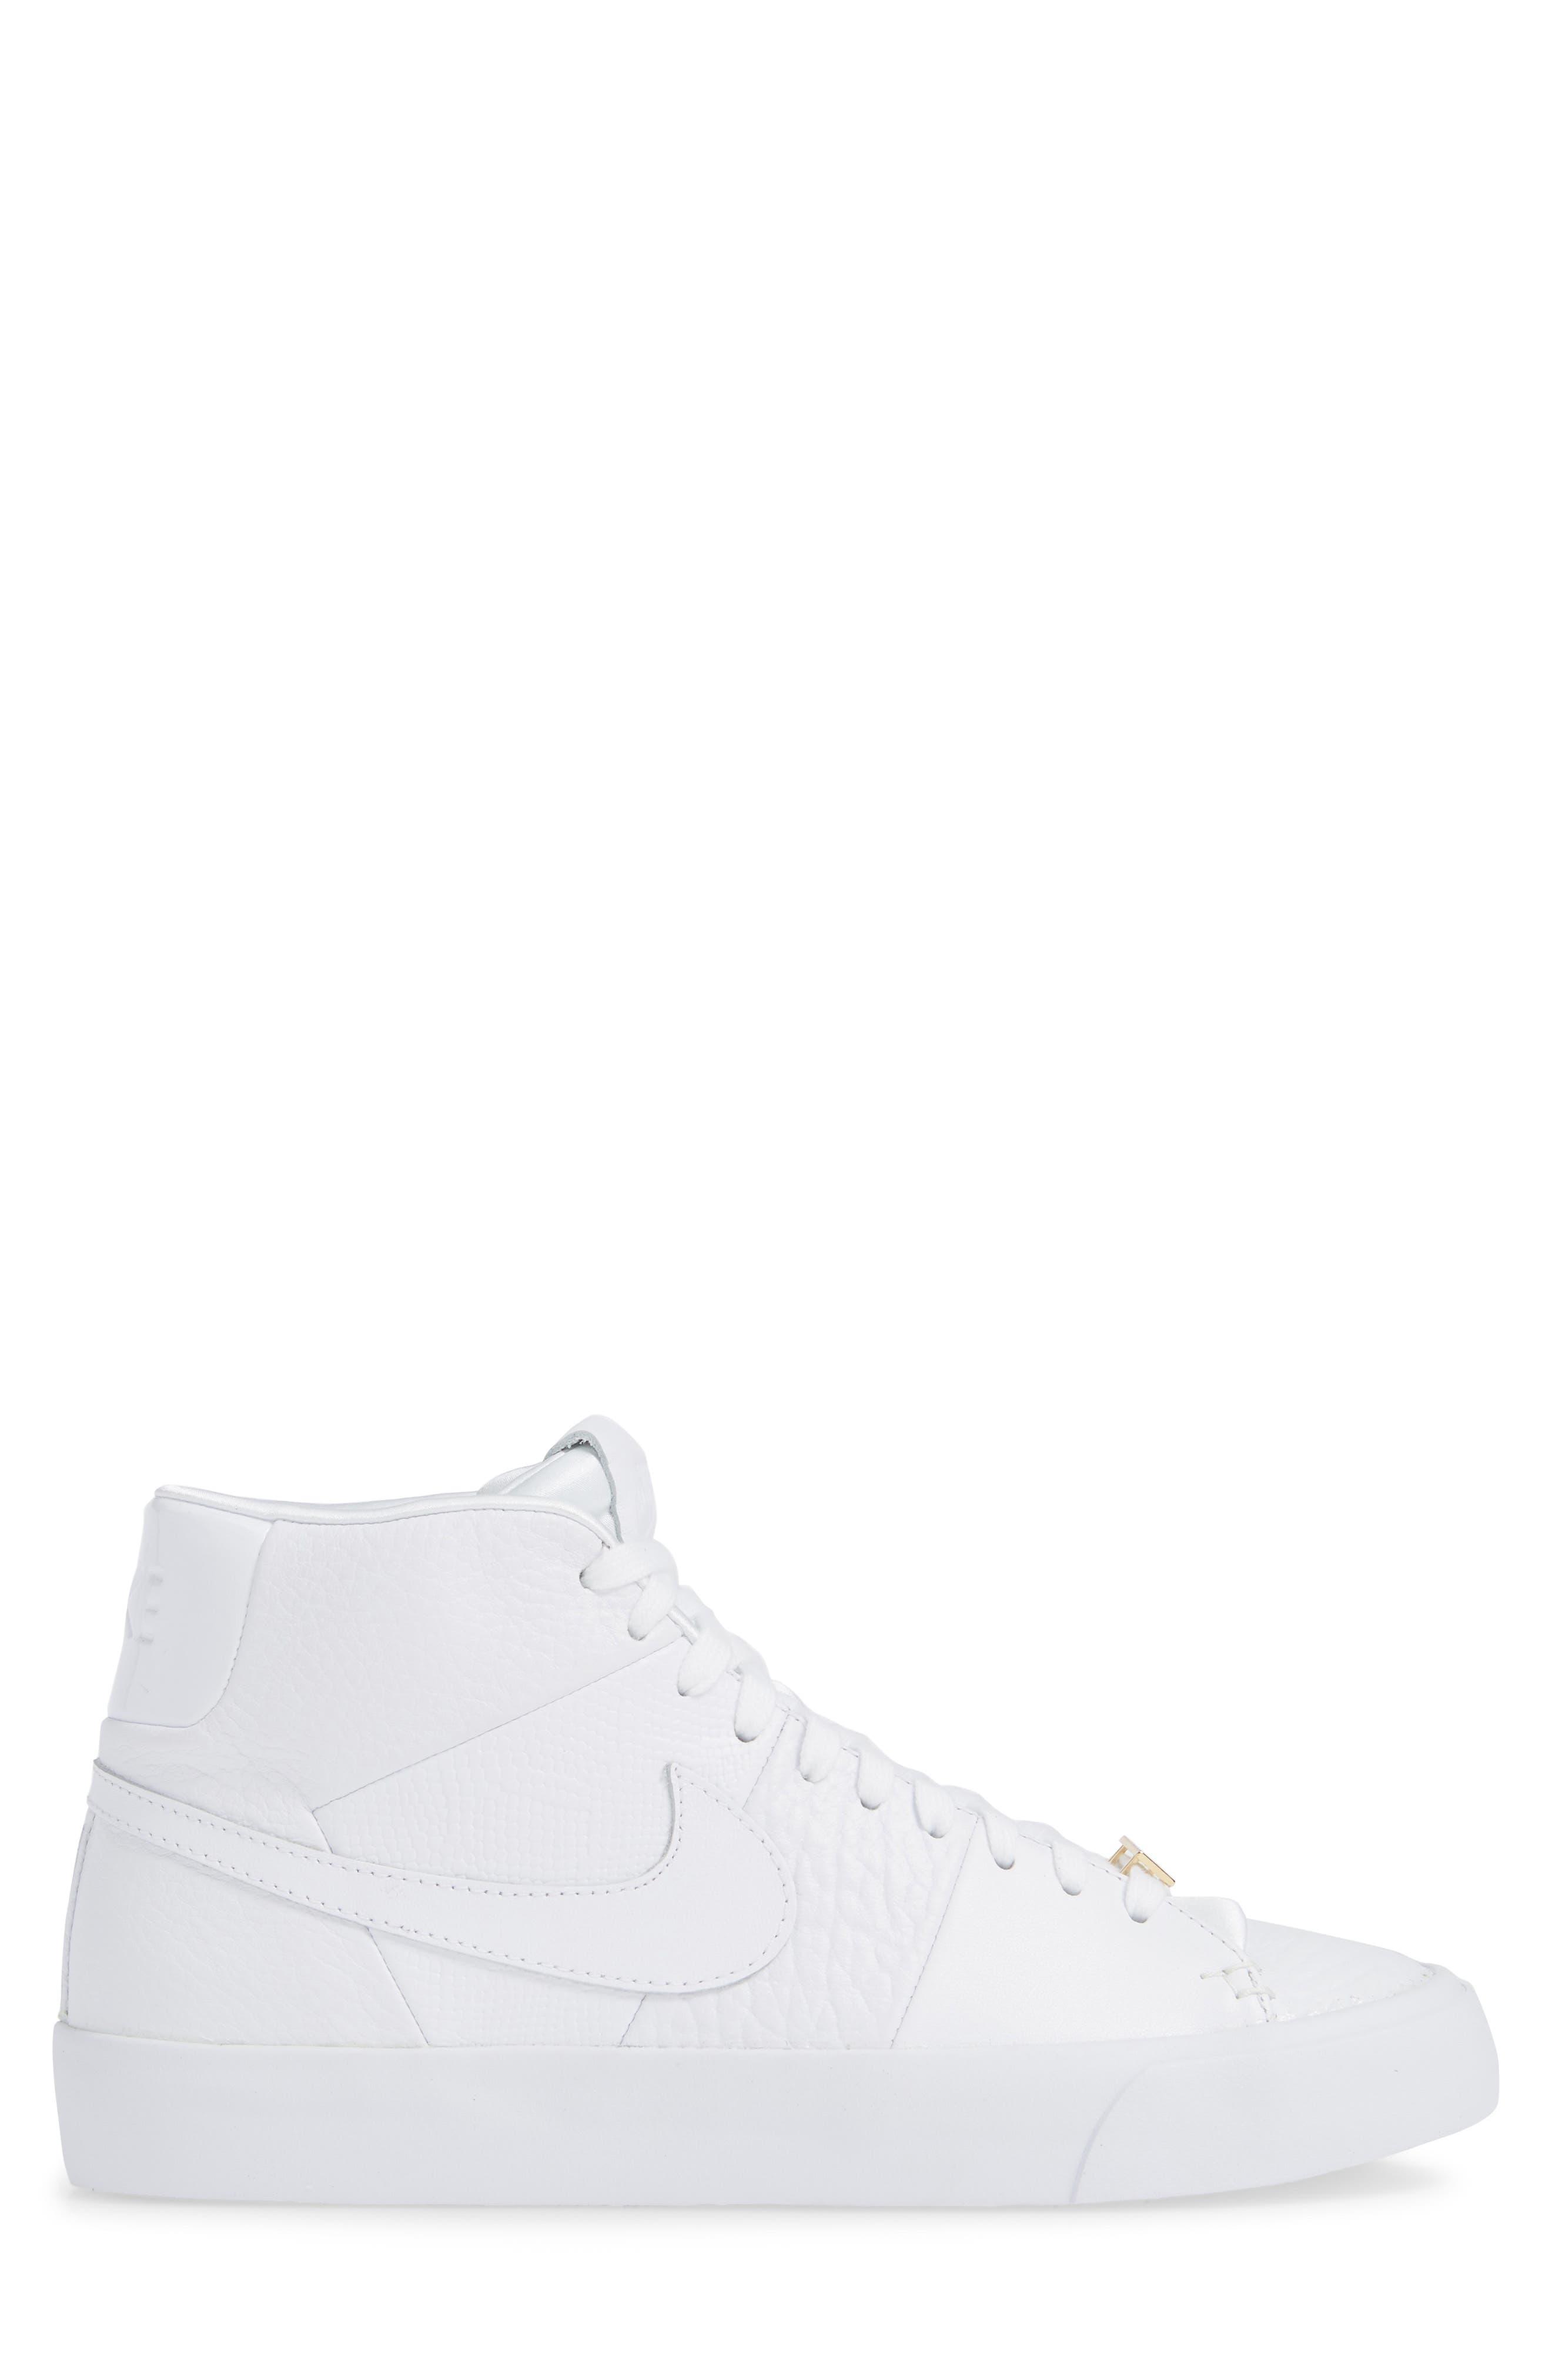 Blazer Royal QS High Top Sneaker,                             Alternate thumbnail 3, color,                             WHITE/ WHITE/ WHITE